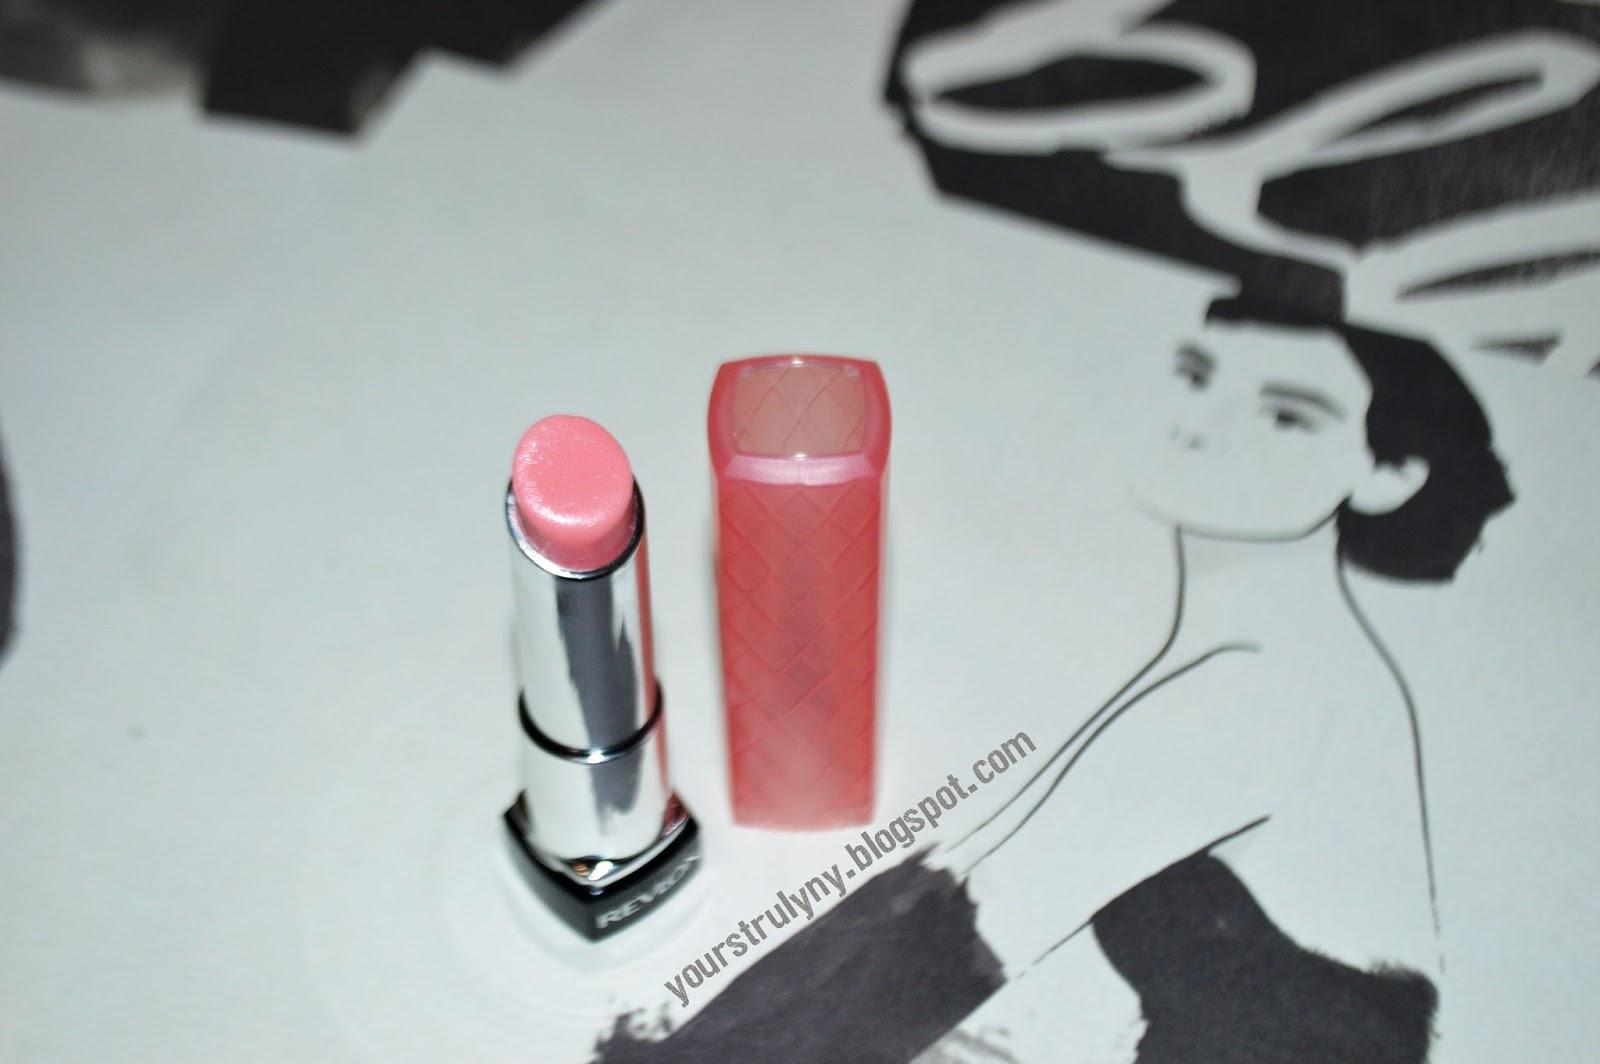 Revlon Colorburst Lip Butter in Pink Lemonade